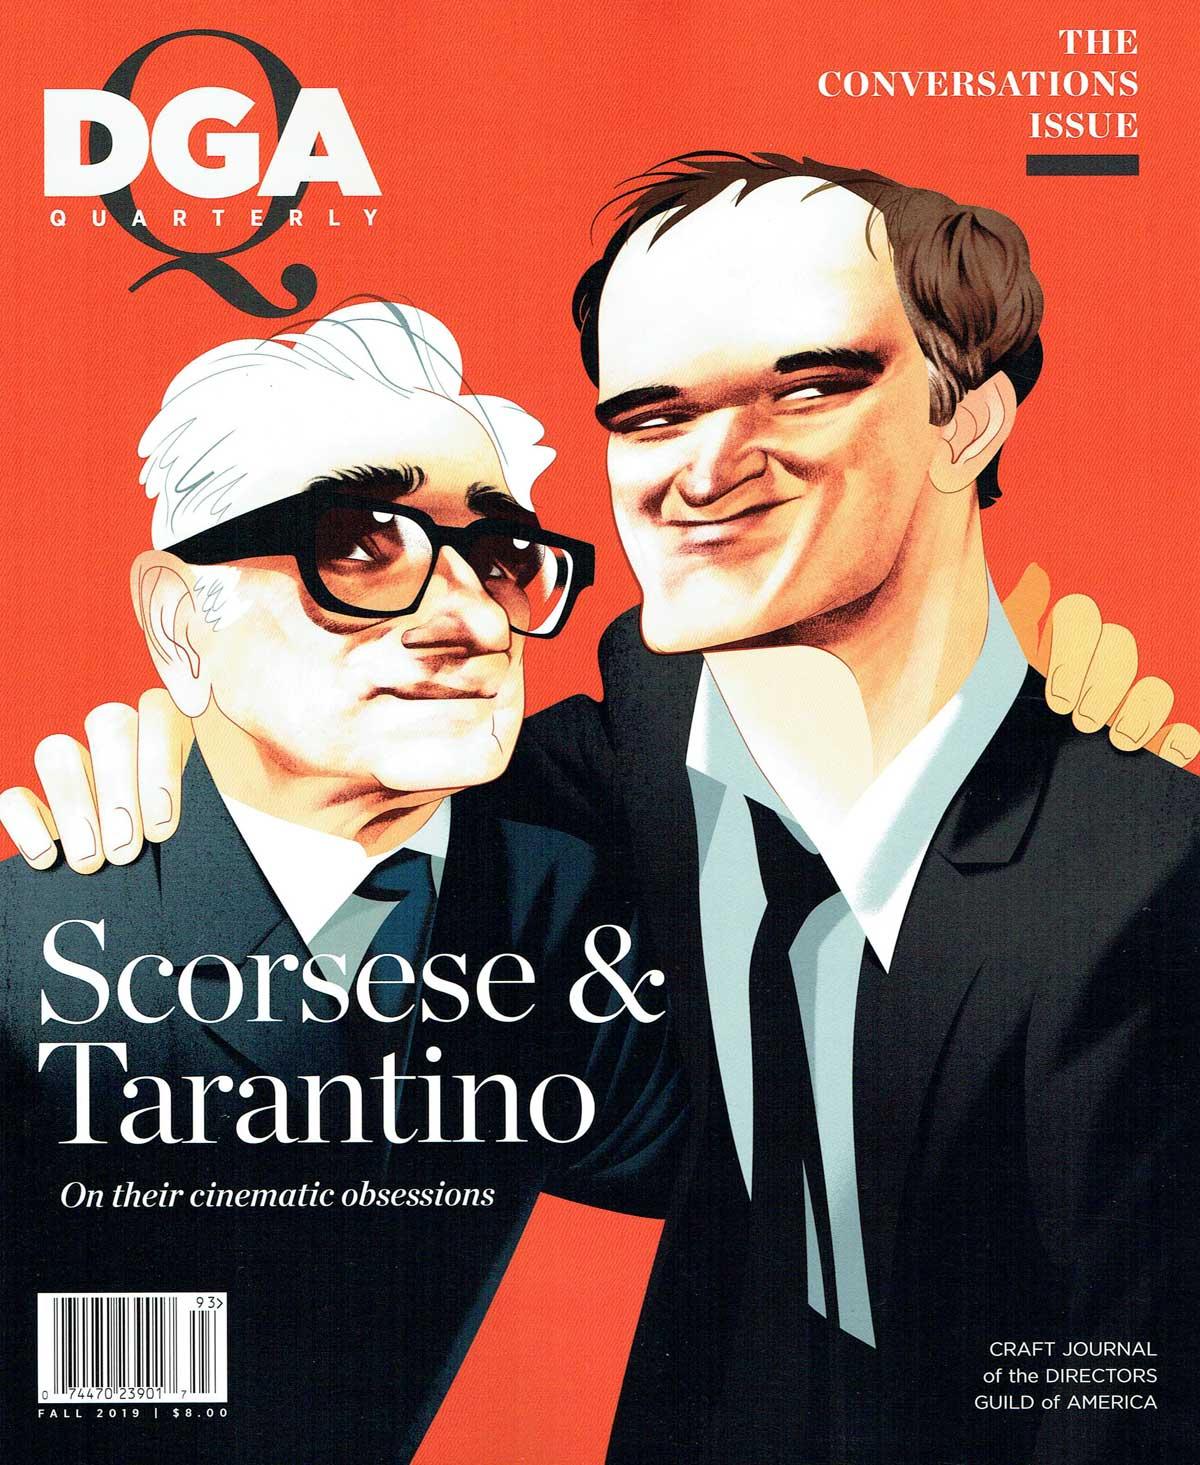 DGA-cover